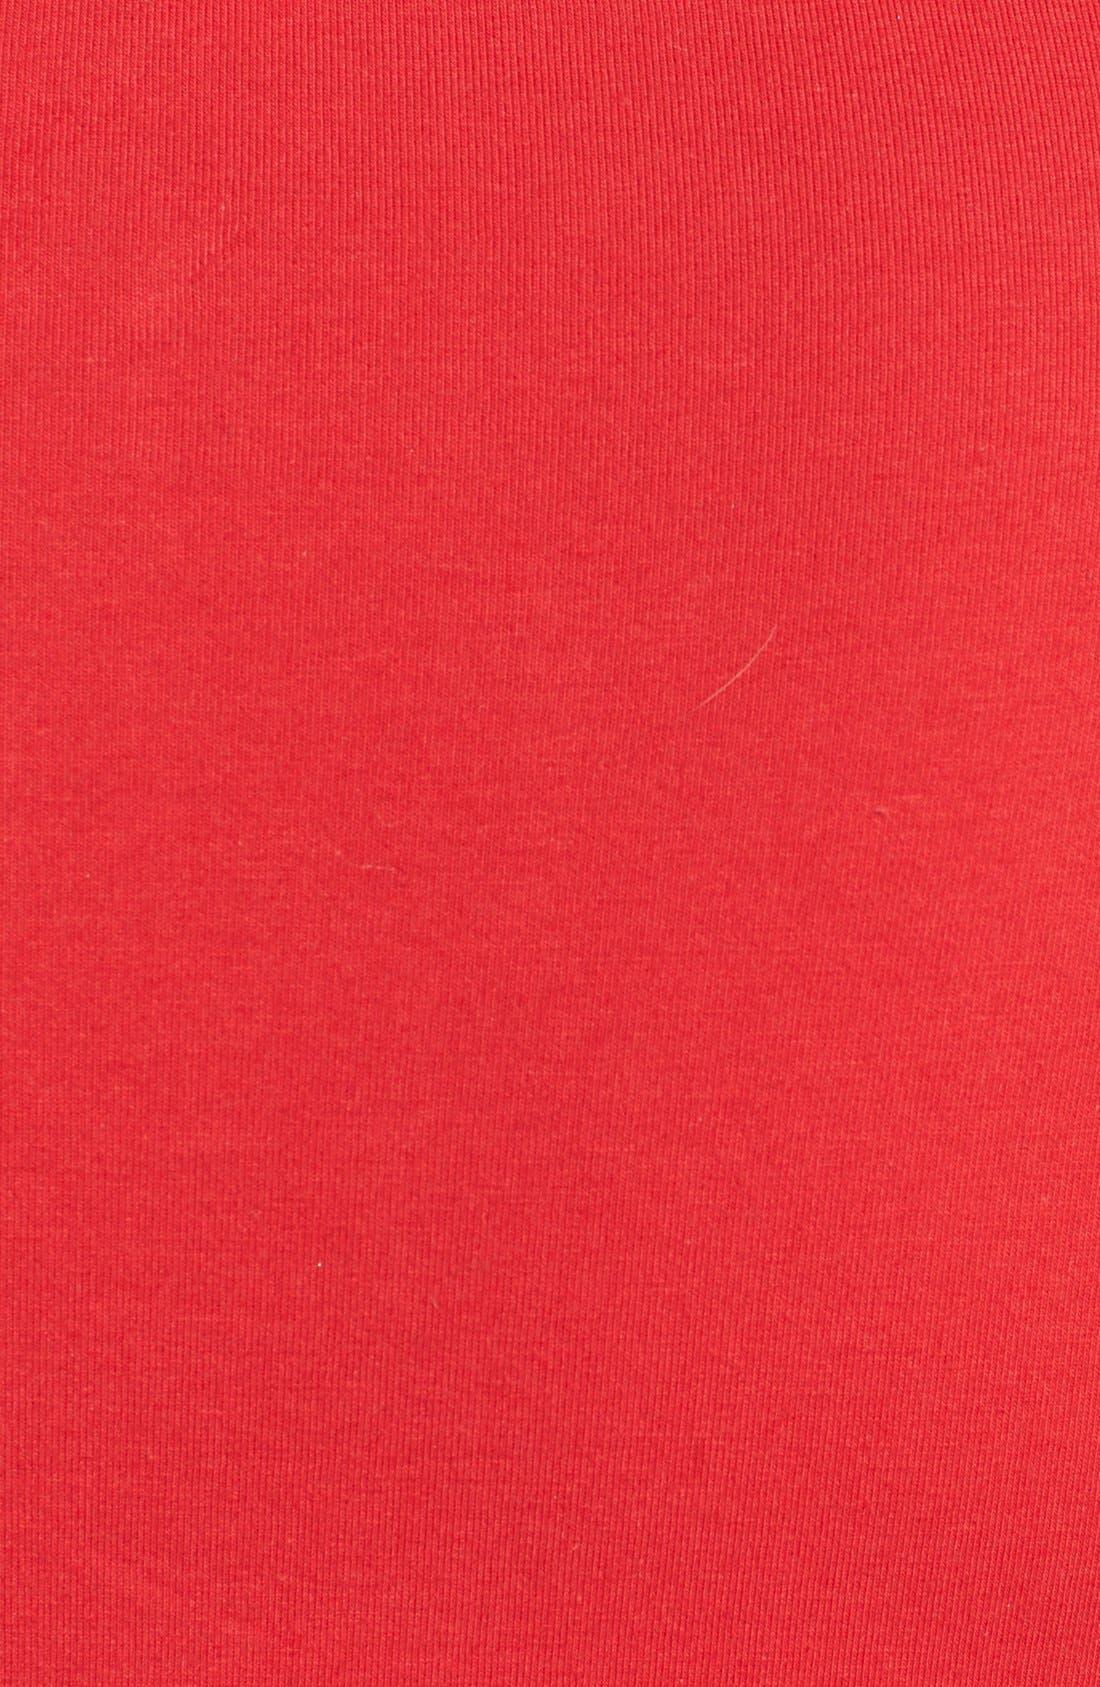 Alternate Image 3  - MICHAEL Michael Kors Zip Shirred Shoulder Top